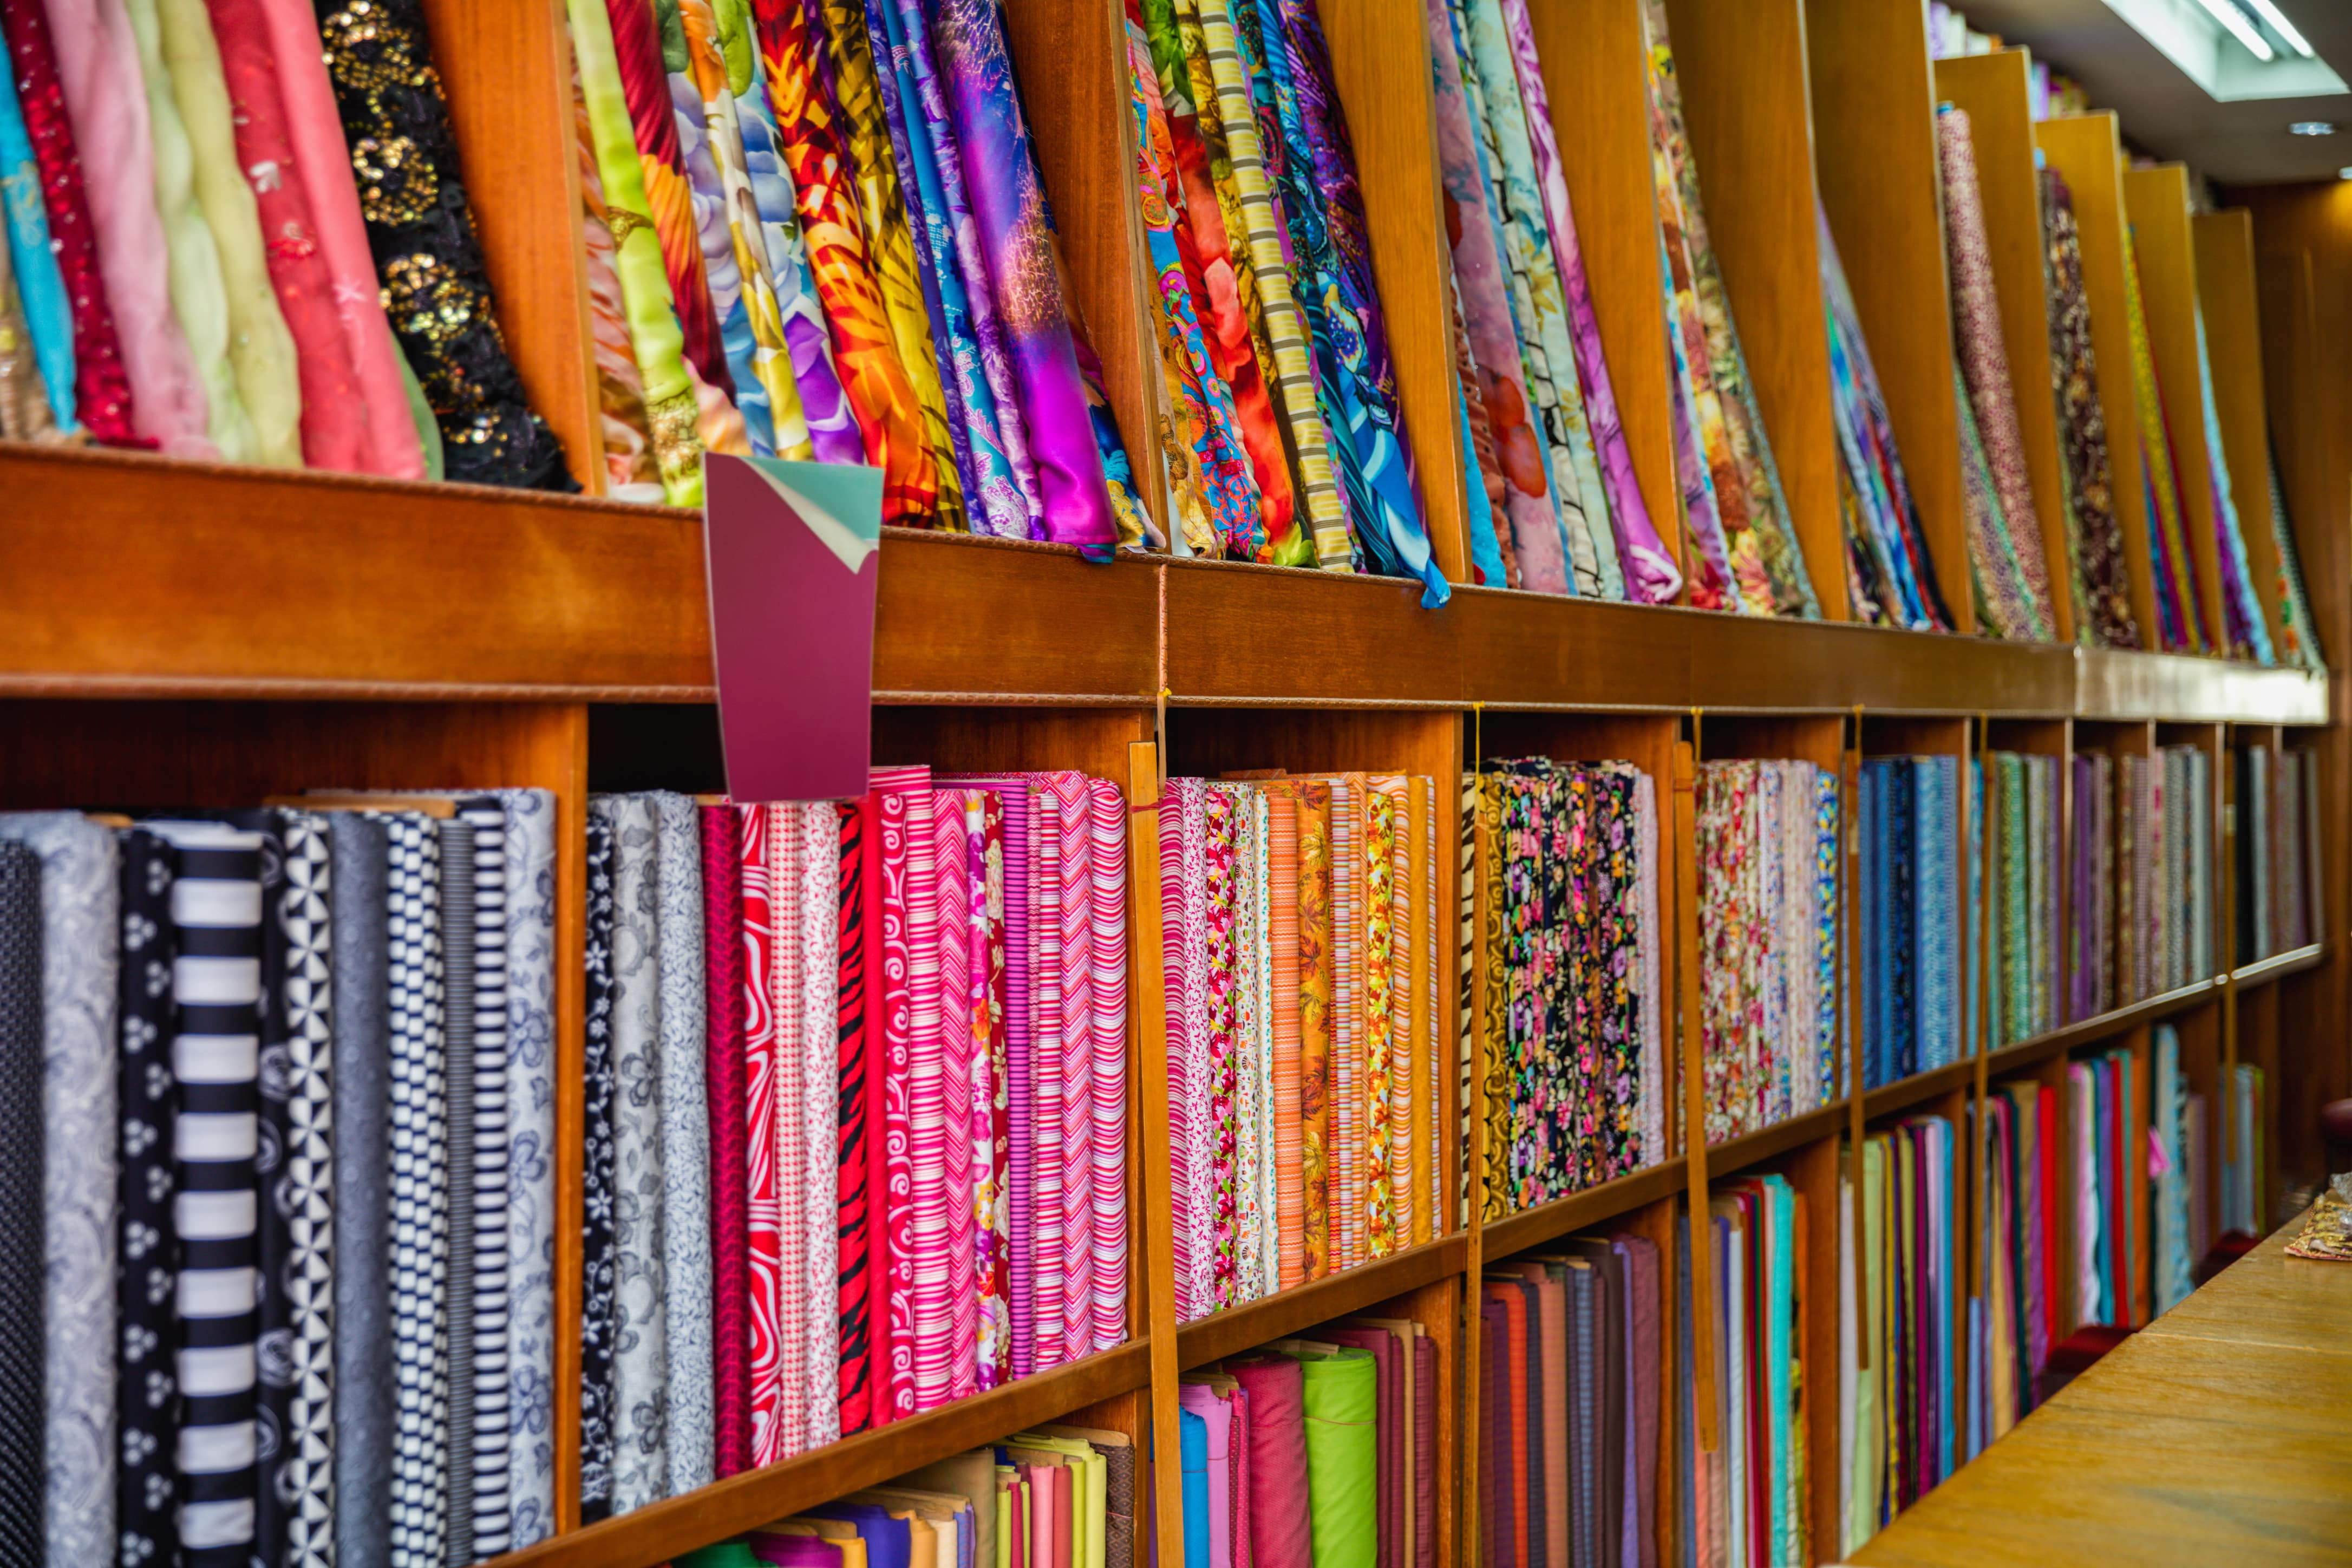 tissu paris, tissus paris, tissu paris pas cher, tissus paris pas cher, acheter du tissu, acheter tissu, tissu pas cher, tissu paris pas cher, acheter son tissu, acheter tissu pas cher, site de vente de tissu, site de vente de tissus, vente de tissu, vente de tissus, tissu en ligne, tissus en ligne, tissu au mètre, tissu au mètre pas cher, tissu bobigny, tissu pas cher bobigny, tissus prêt à porter, tissus haute couture, grossiste tissu paris, grossiste tissu paris pas cher, grossiste en ligne, tissu d'habillement, vente de tissu au mètre, bon plan tissu, bon plan tissu paris, bon plan tissus paris, acheter du tissu à paris, tissus déco, acheter des tissus, acheter des tissus au mètre, acheter des tissus pas cher, tissu satin duchesse, tissu simili cuir, tissu mousseline, tissu polyester, tissu viscose, tissu fourrure artificielle, tissu fausse fourrure, tissu dentelle perlée, tissu broderie anglaise, tissu taffetas brodé, tissu soie, tissu coton, tissu asiatique, tissu vichy, tissu madras, tissu enfant, tissu ameublement, coupons de tissu, tissu mariage, tissu spectacle, tissu Noël, couture, tissu couture, tissu lycra, tissu velour, tissu mode, tissu accessoires, tissu, tissus, vente de tissu en ligne, vente de tissus en ligne, tissus de qualité, acheter tissus de qualité, acheter tissus de qualité en ligne